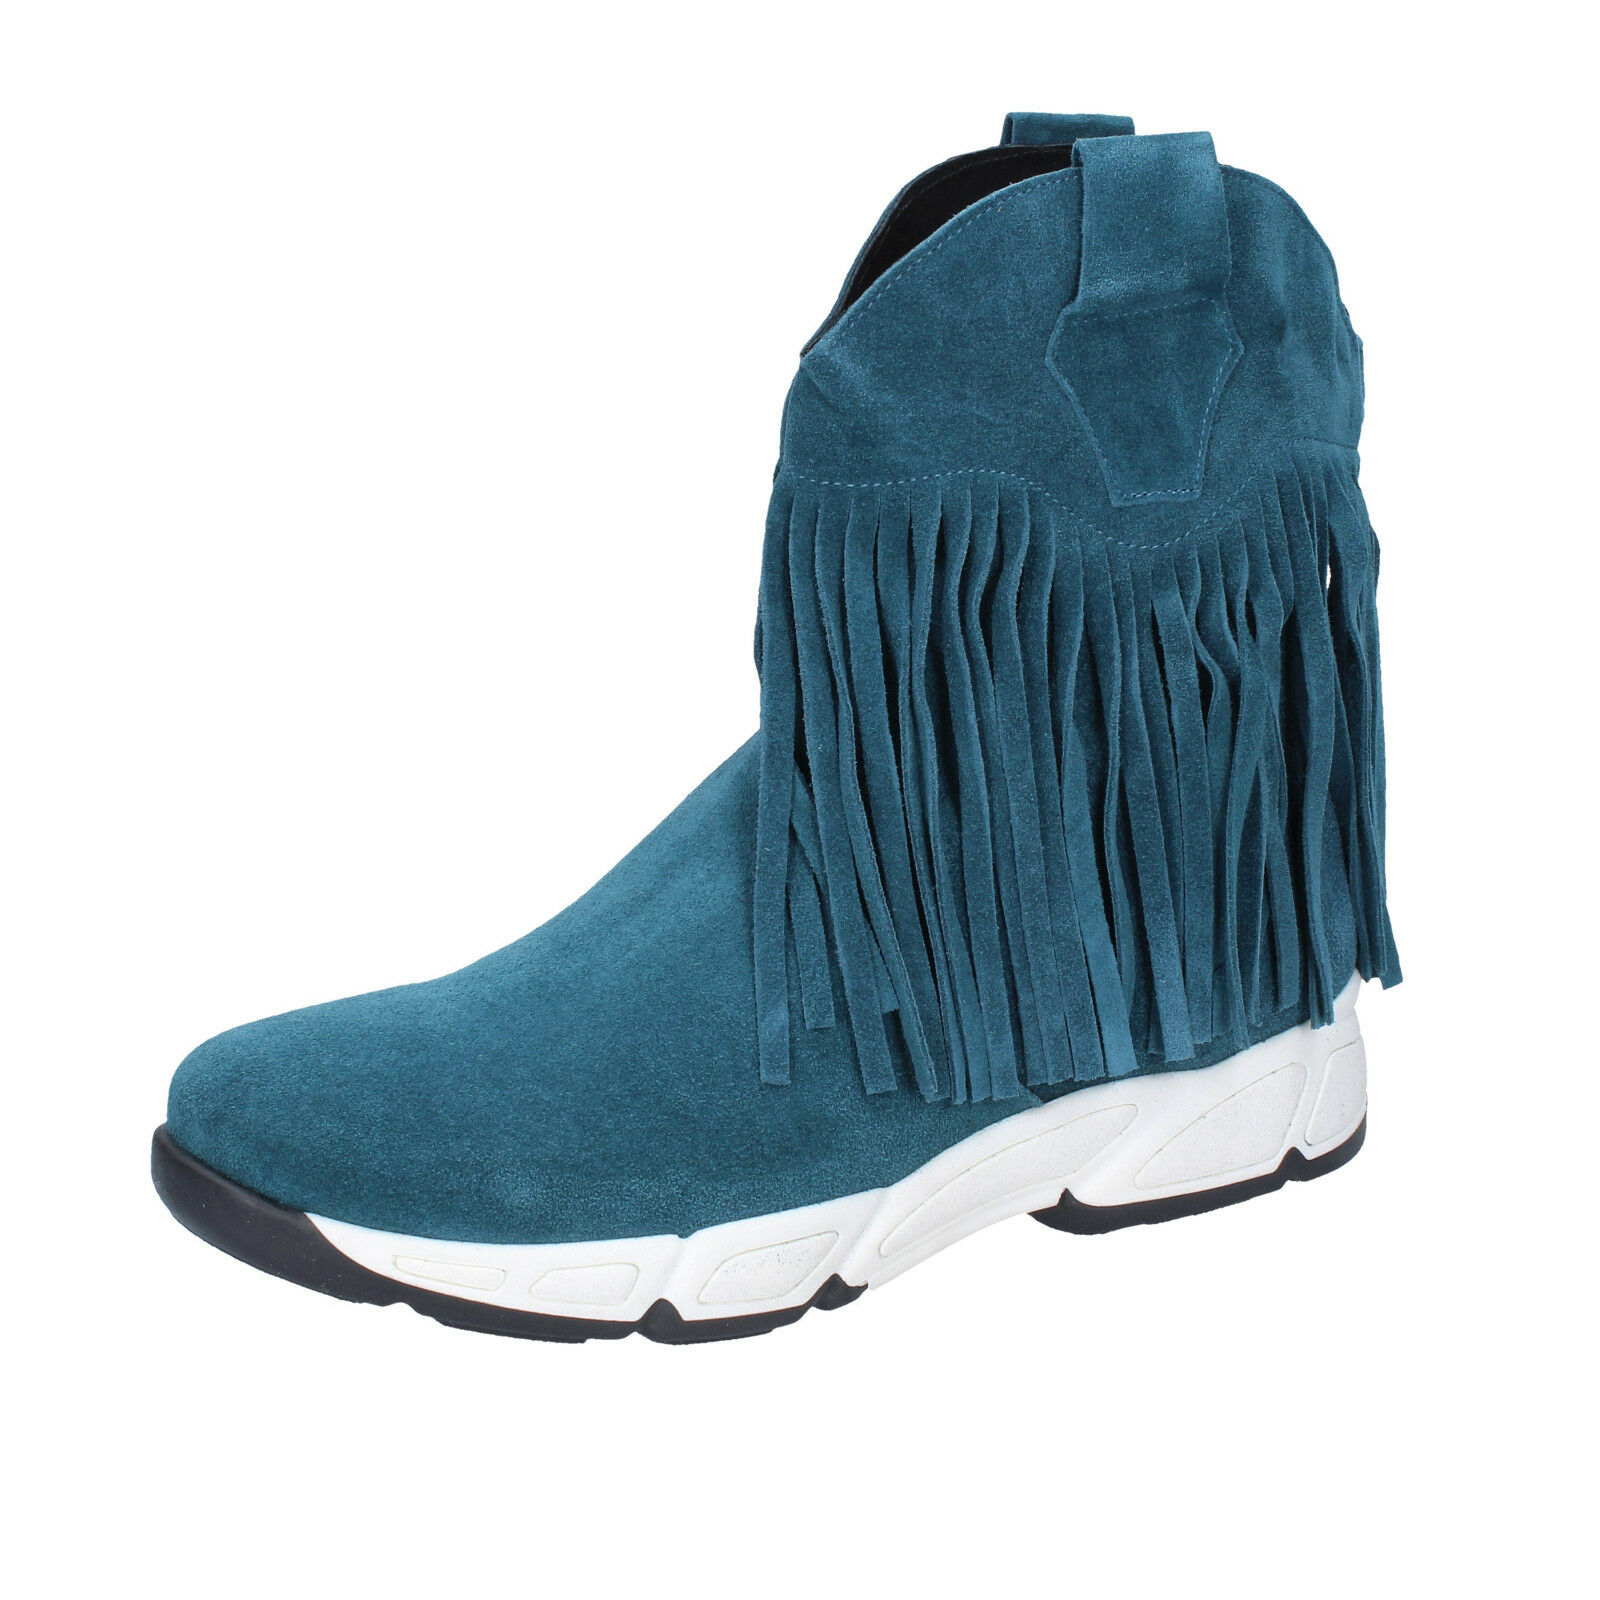 Damen schuhe OLGA RUBINI 37 EU ankle boots grün wildleder BX783-37